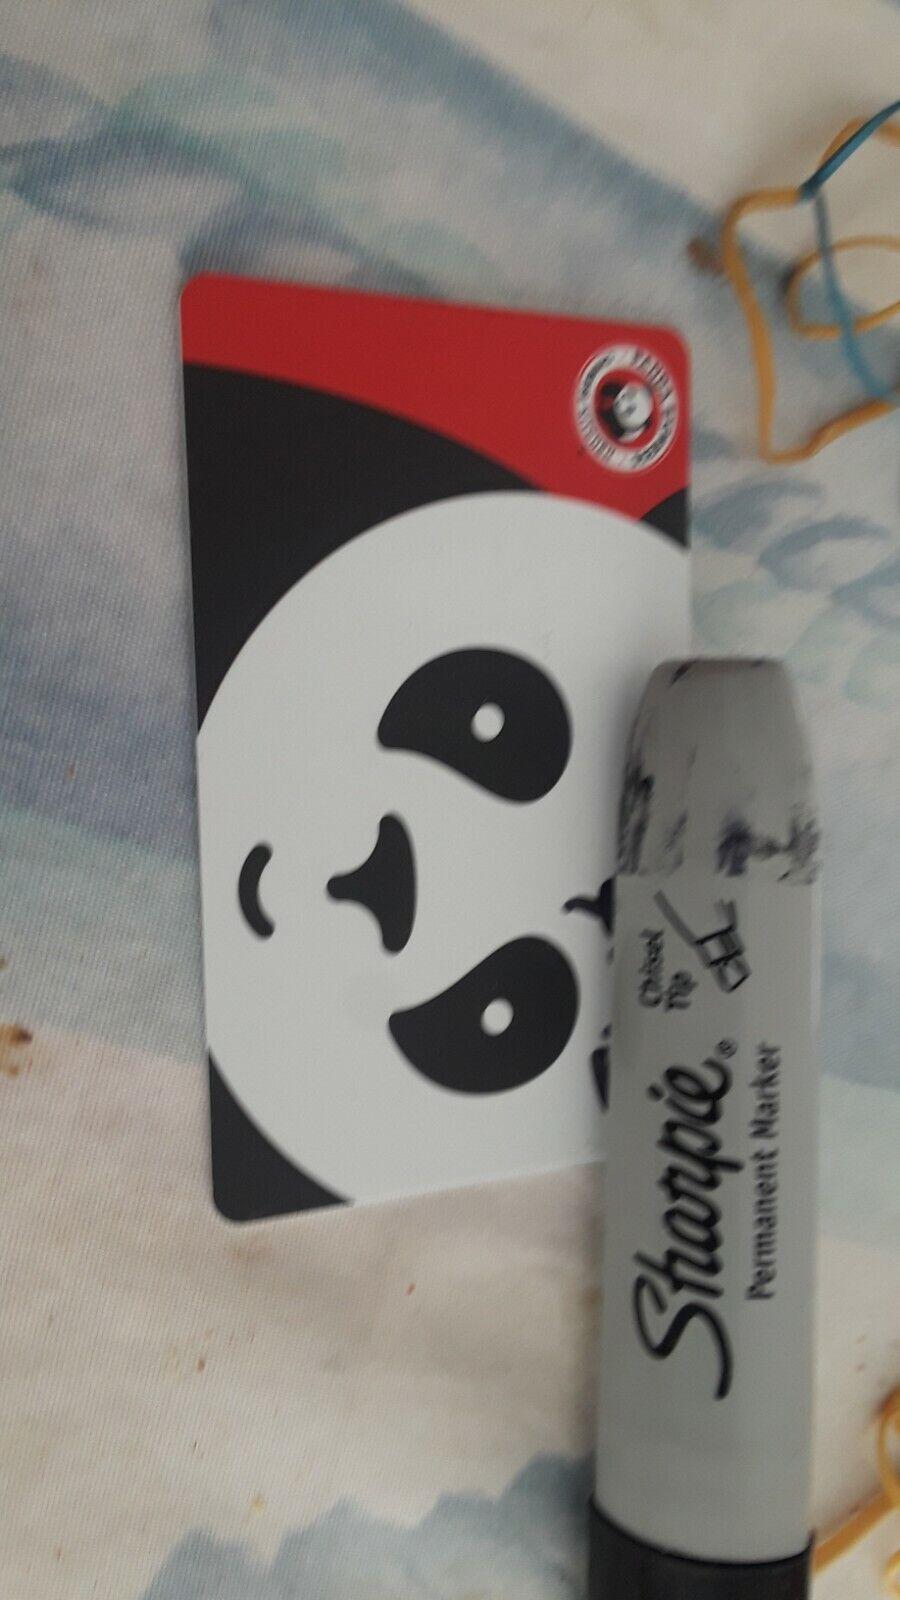 86.30 Panda Express Gift Card FREE SHIPPING - $85.29